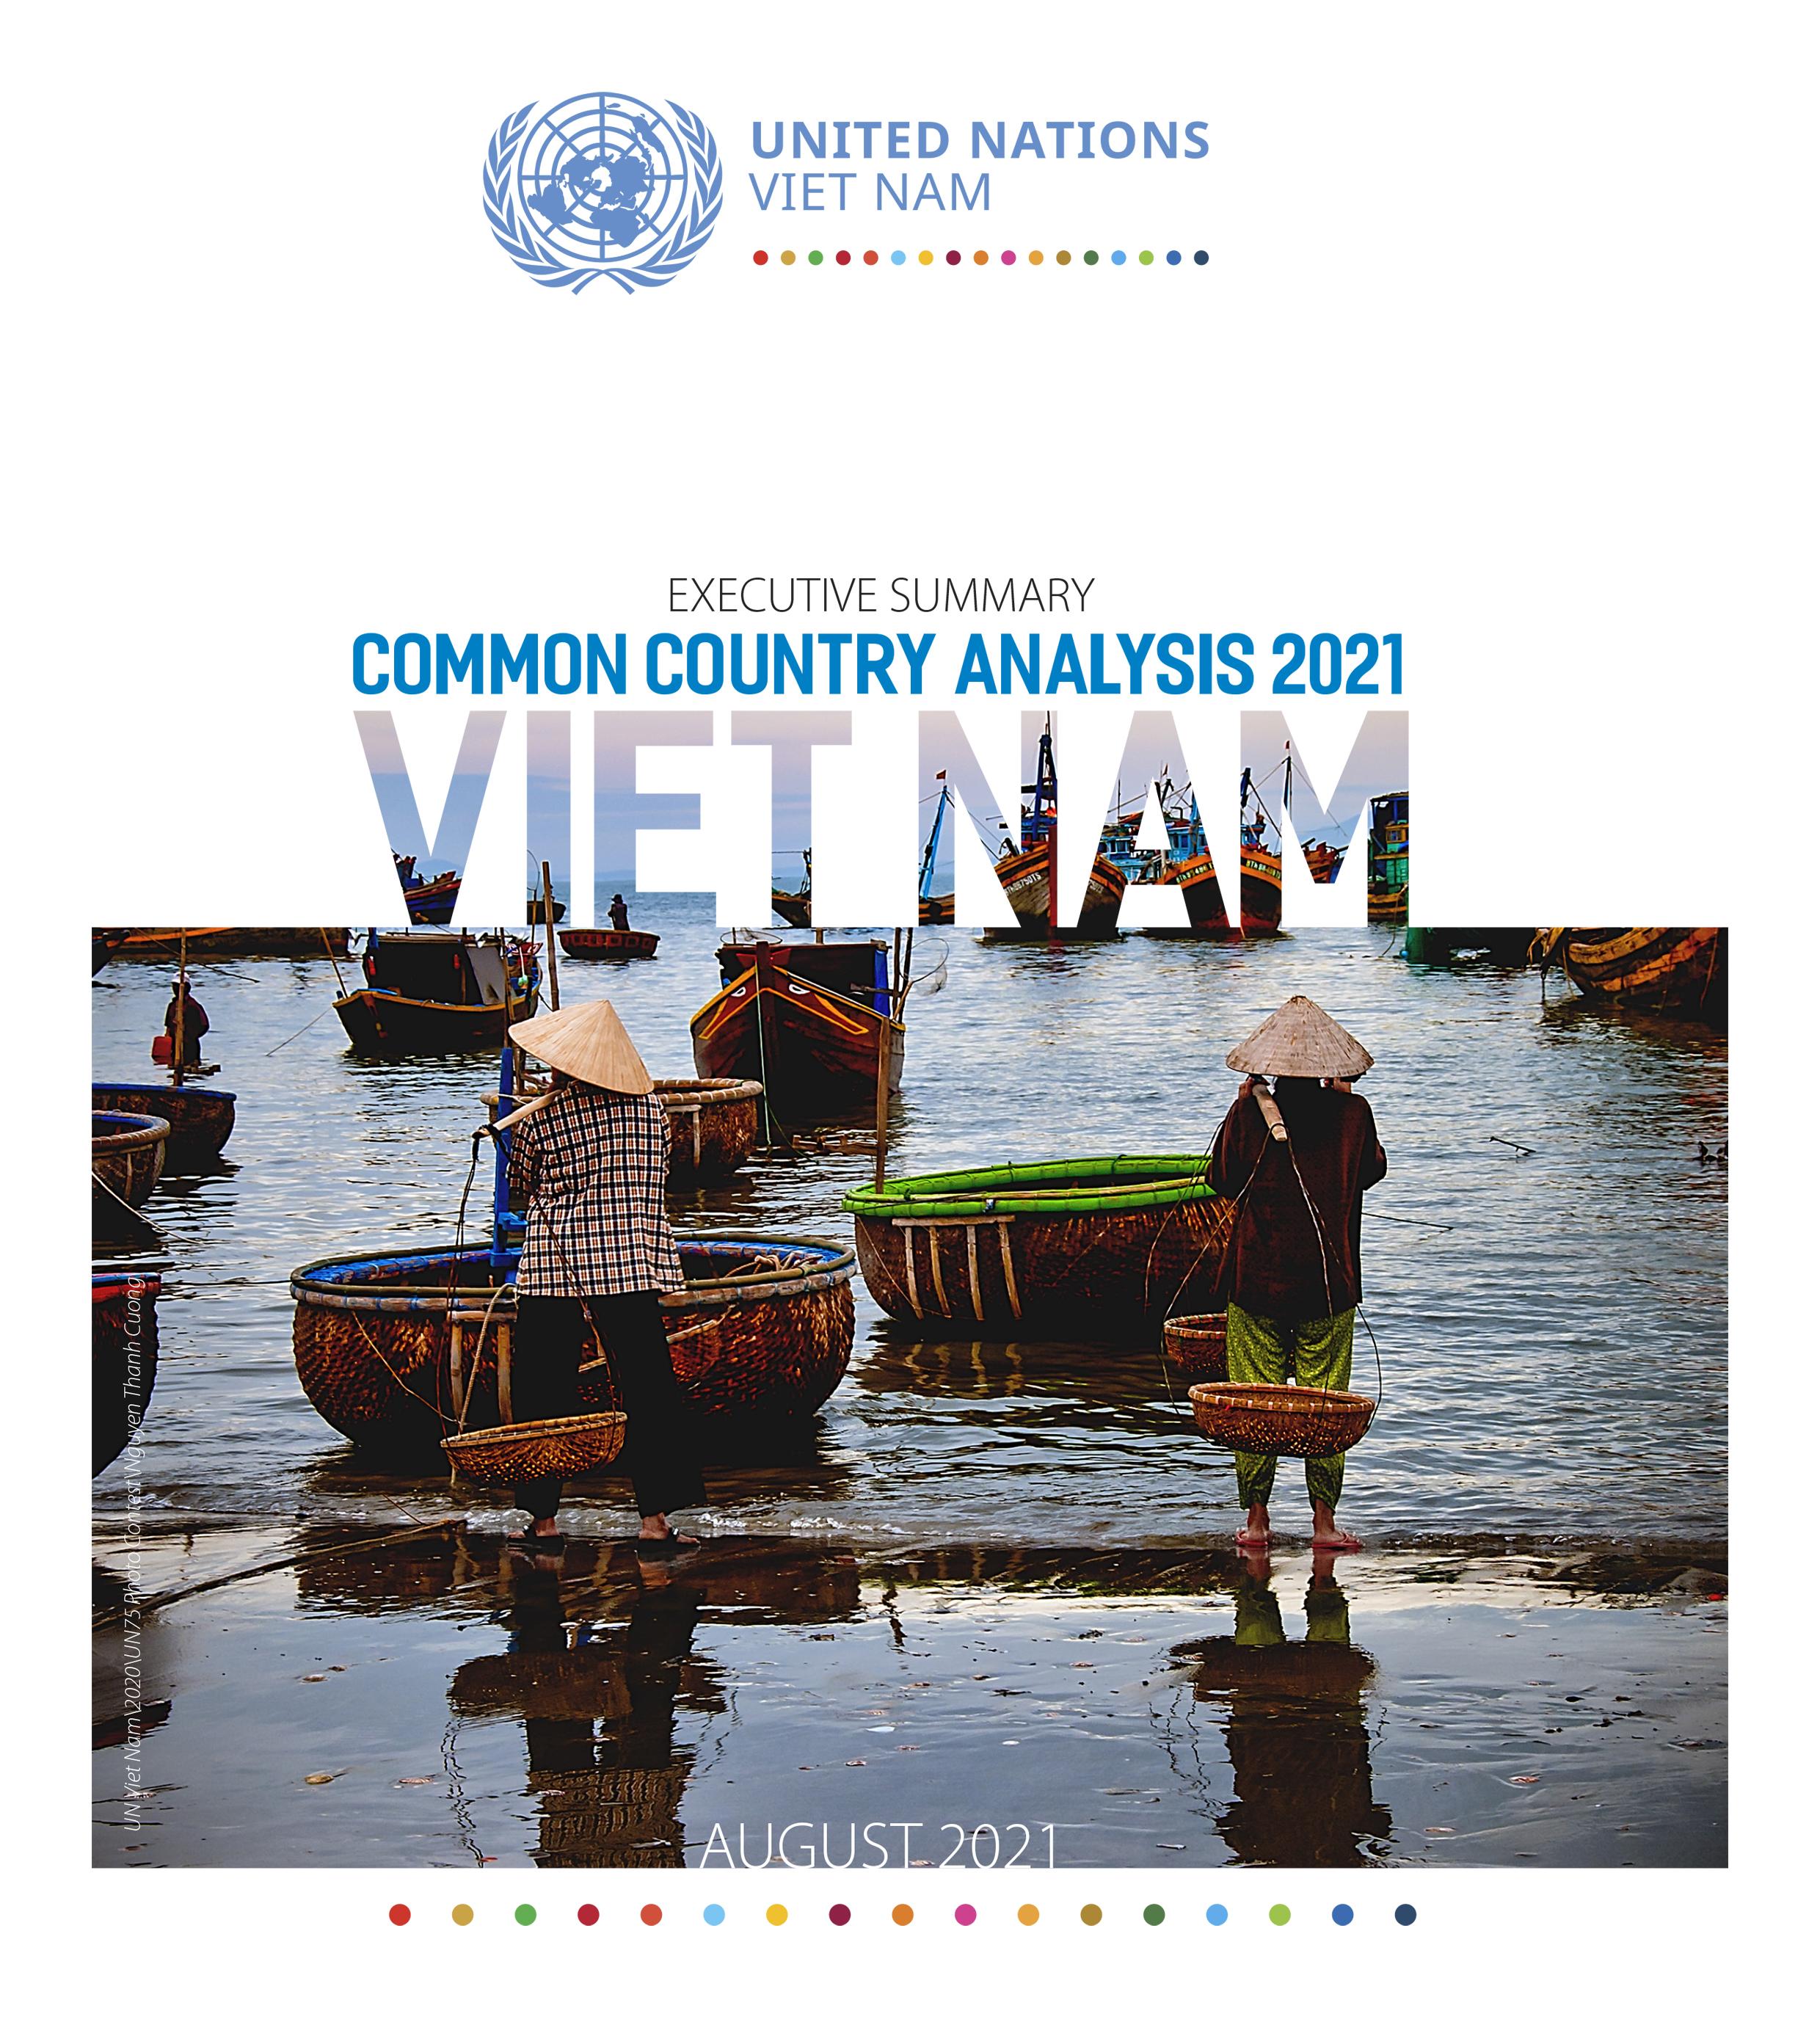 EXECUTIVE SUMMARY: COMMON COUNTRY ANALYSIS 2021 - VIET NAM